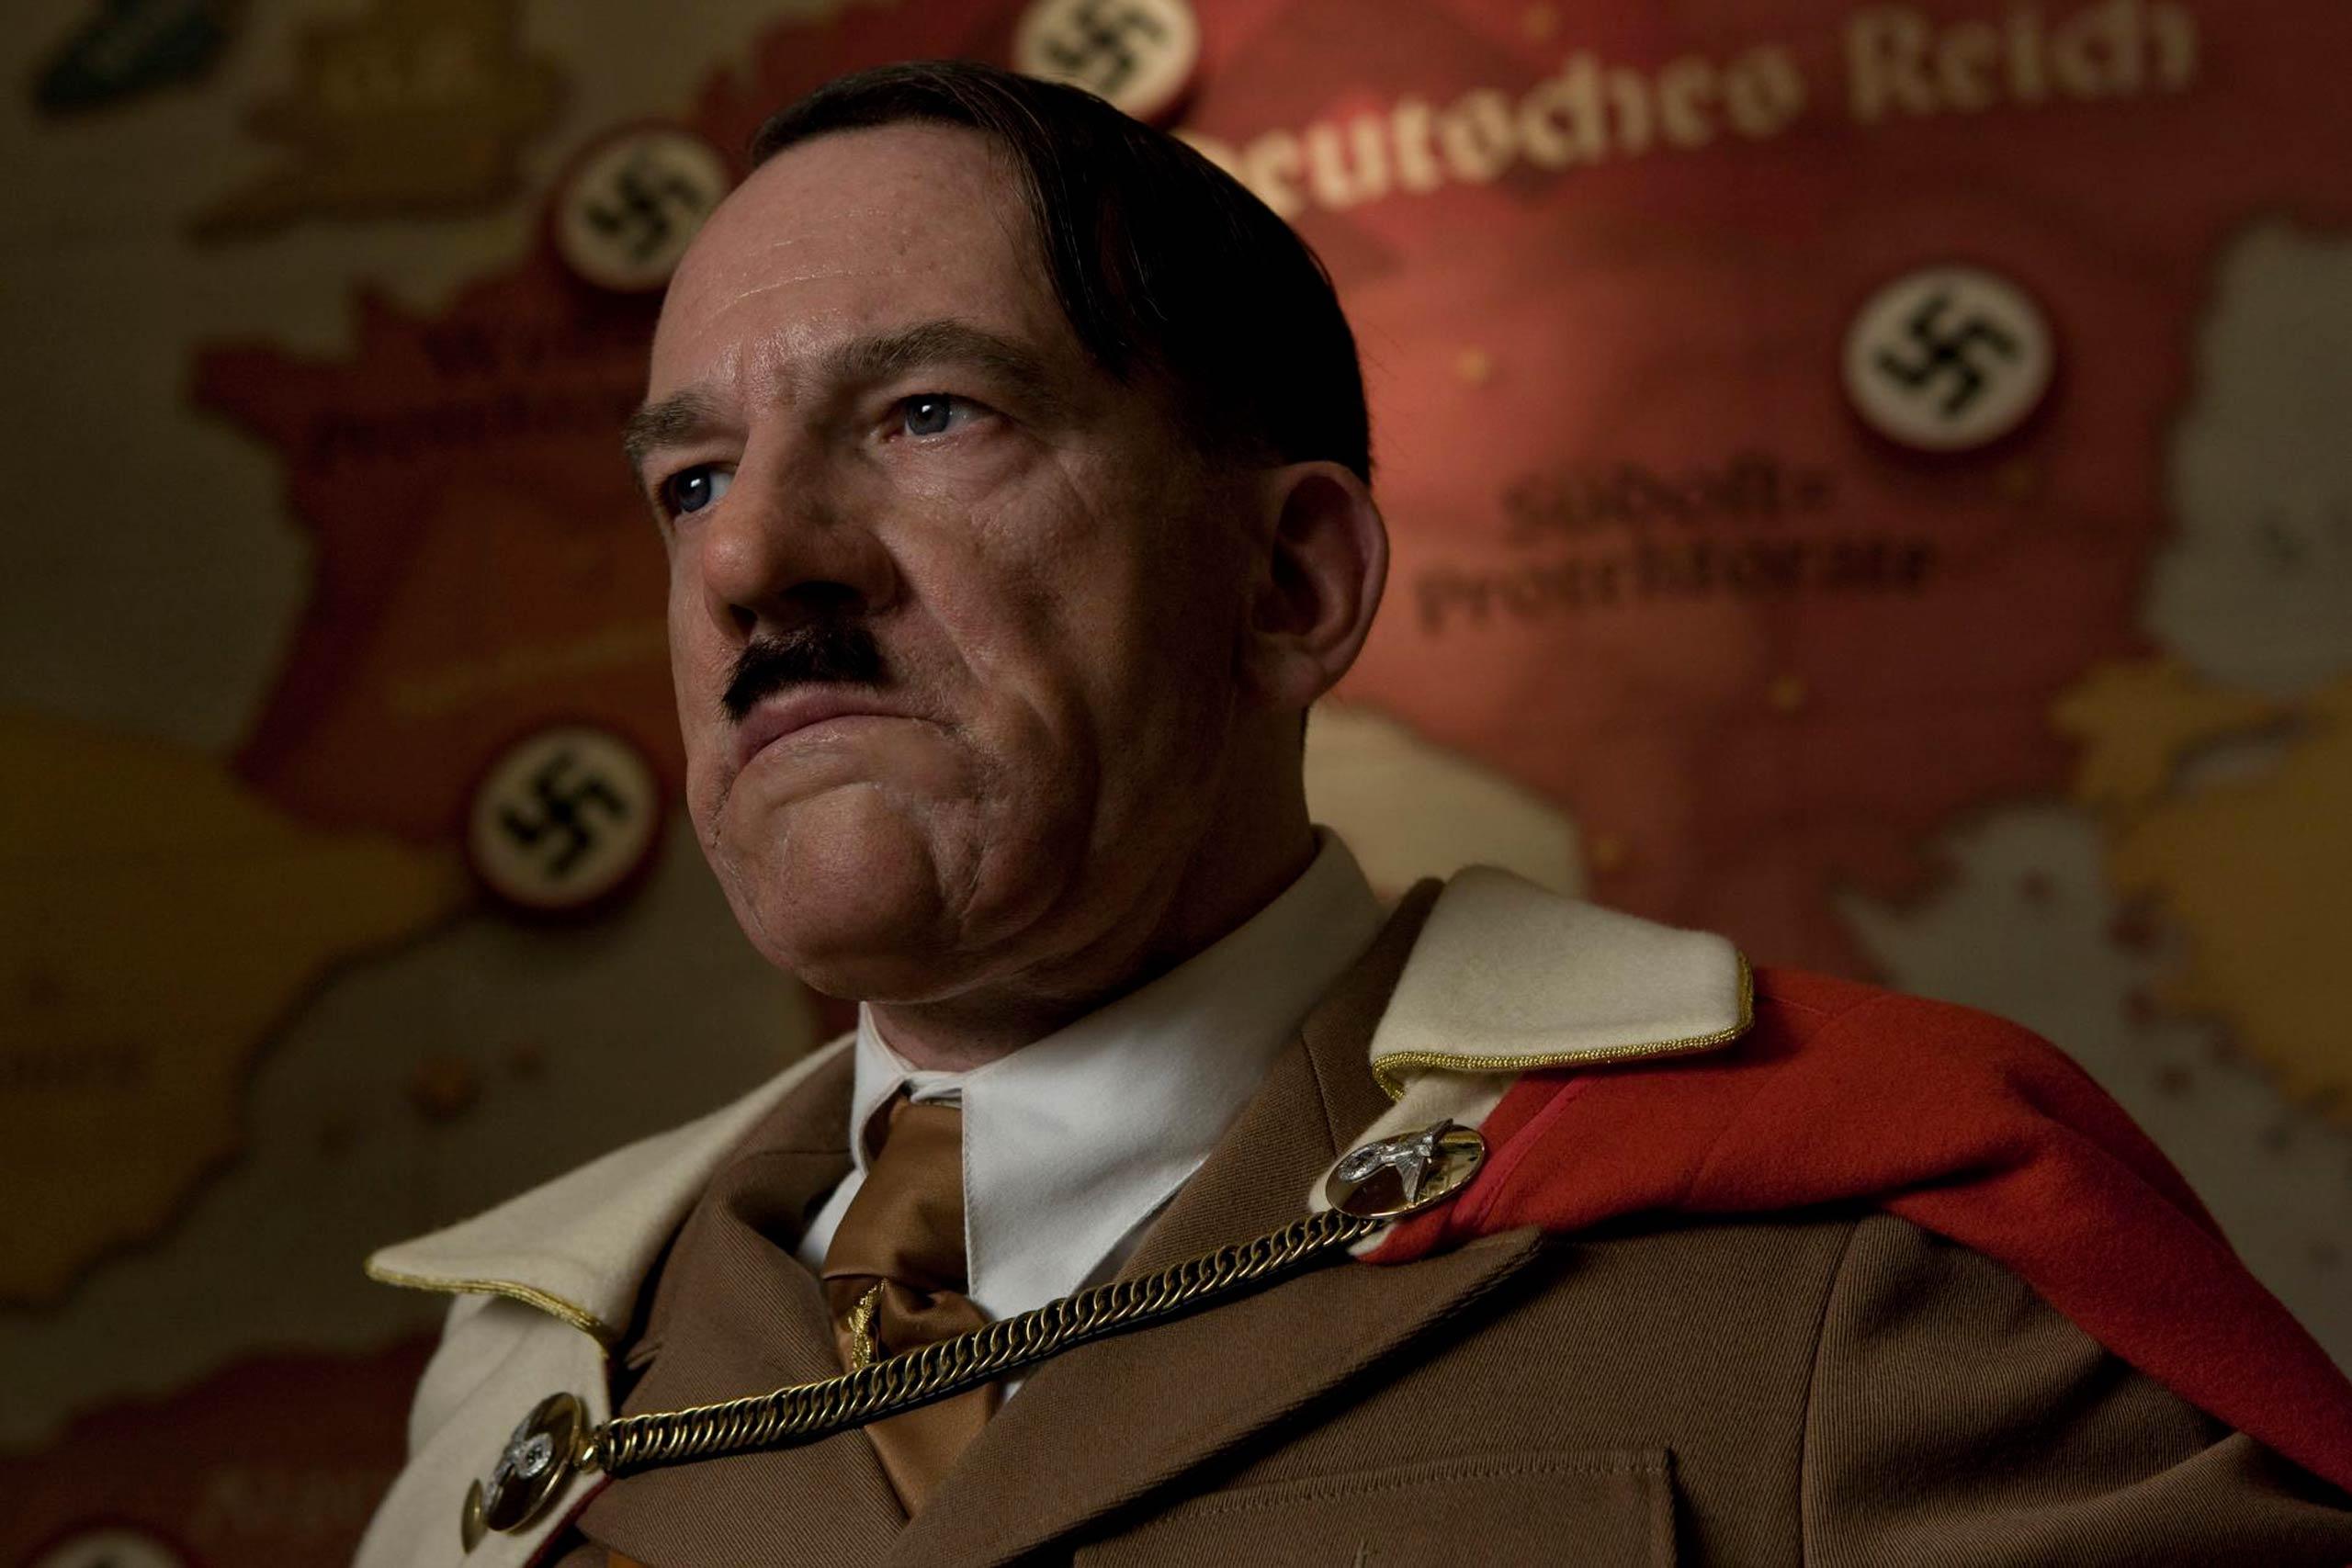 Hitler - Inglourious Basterds